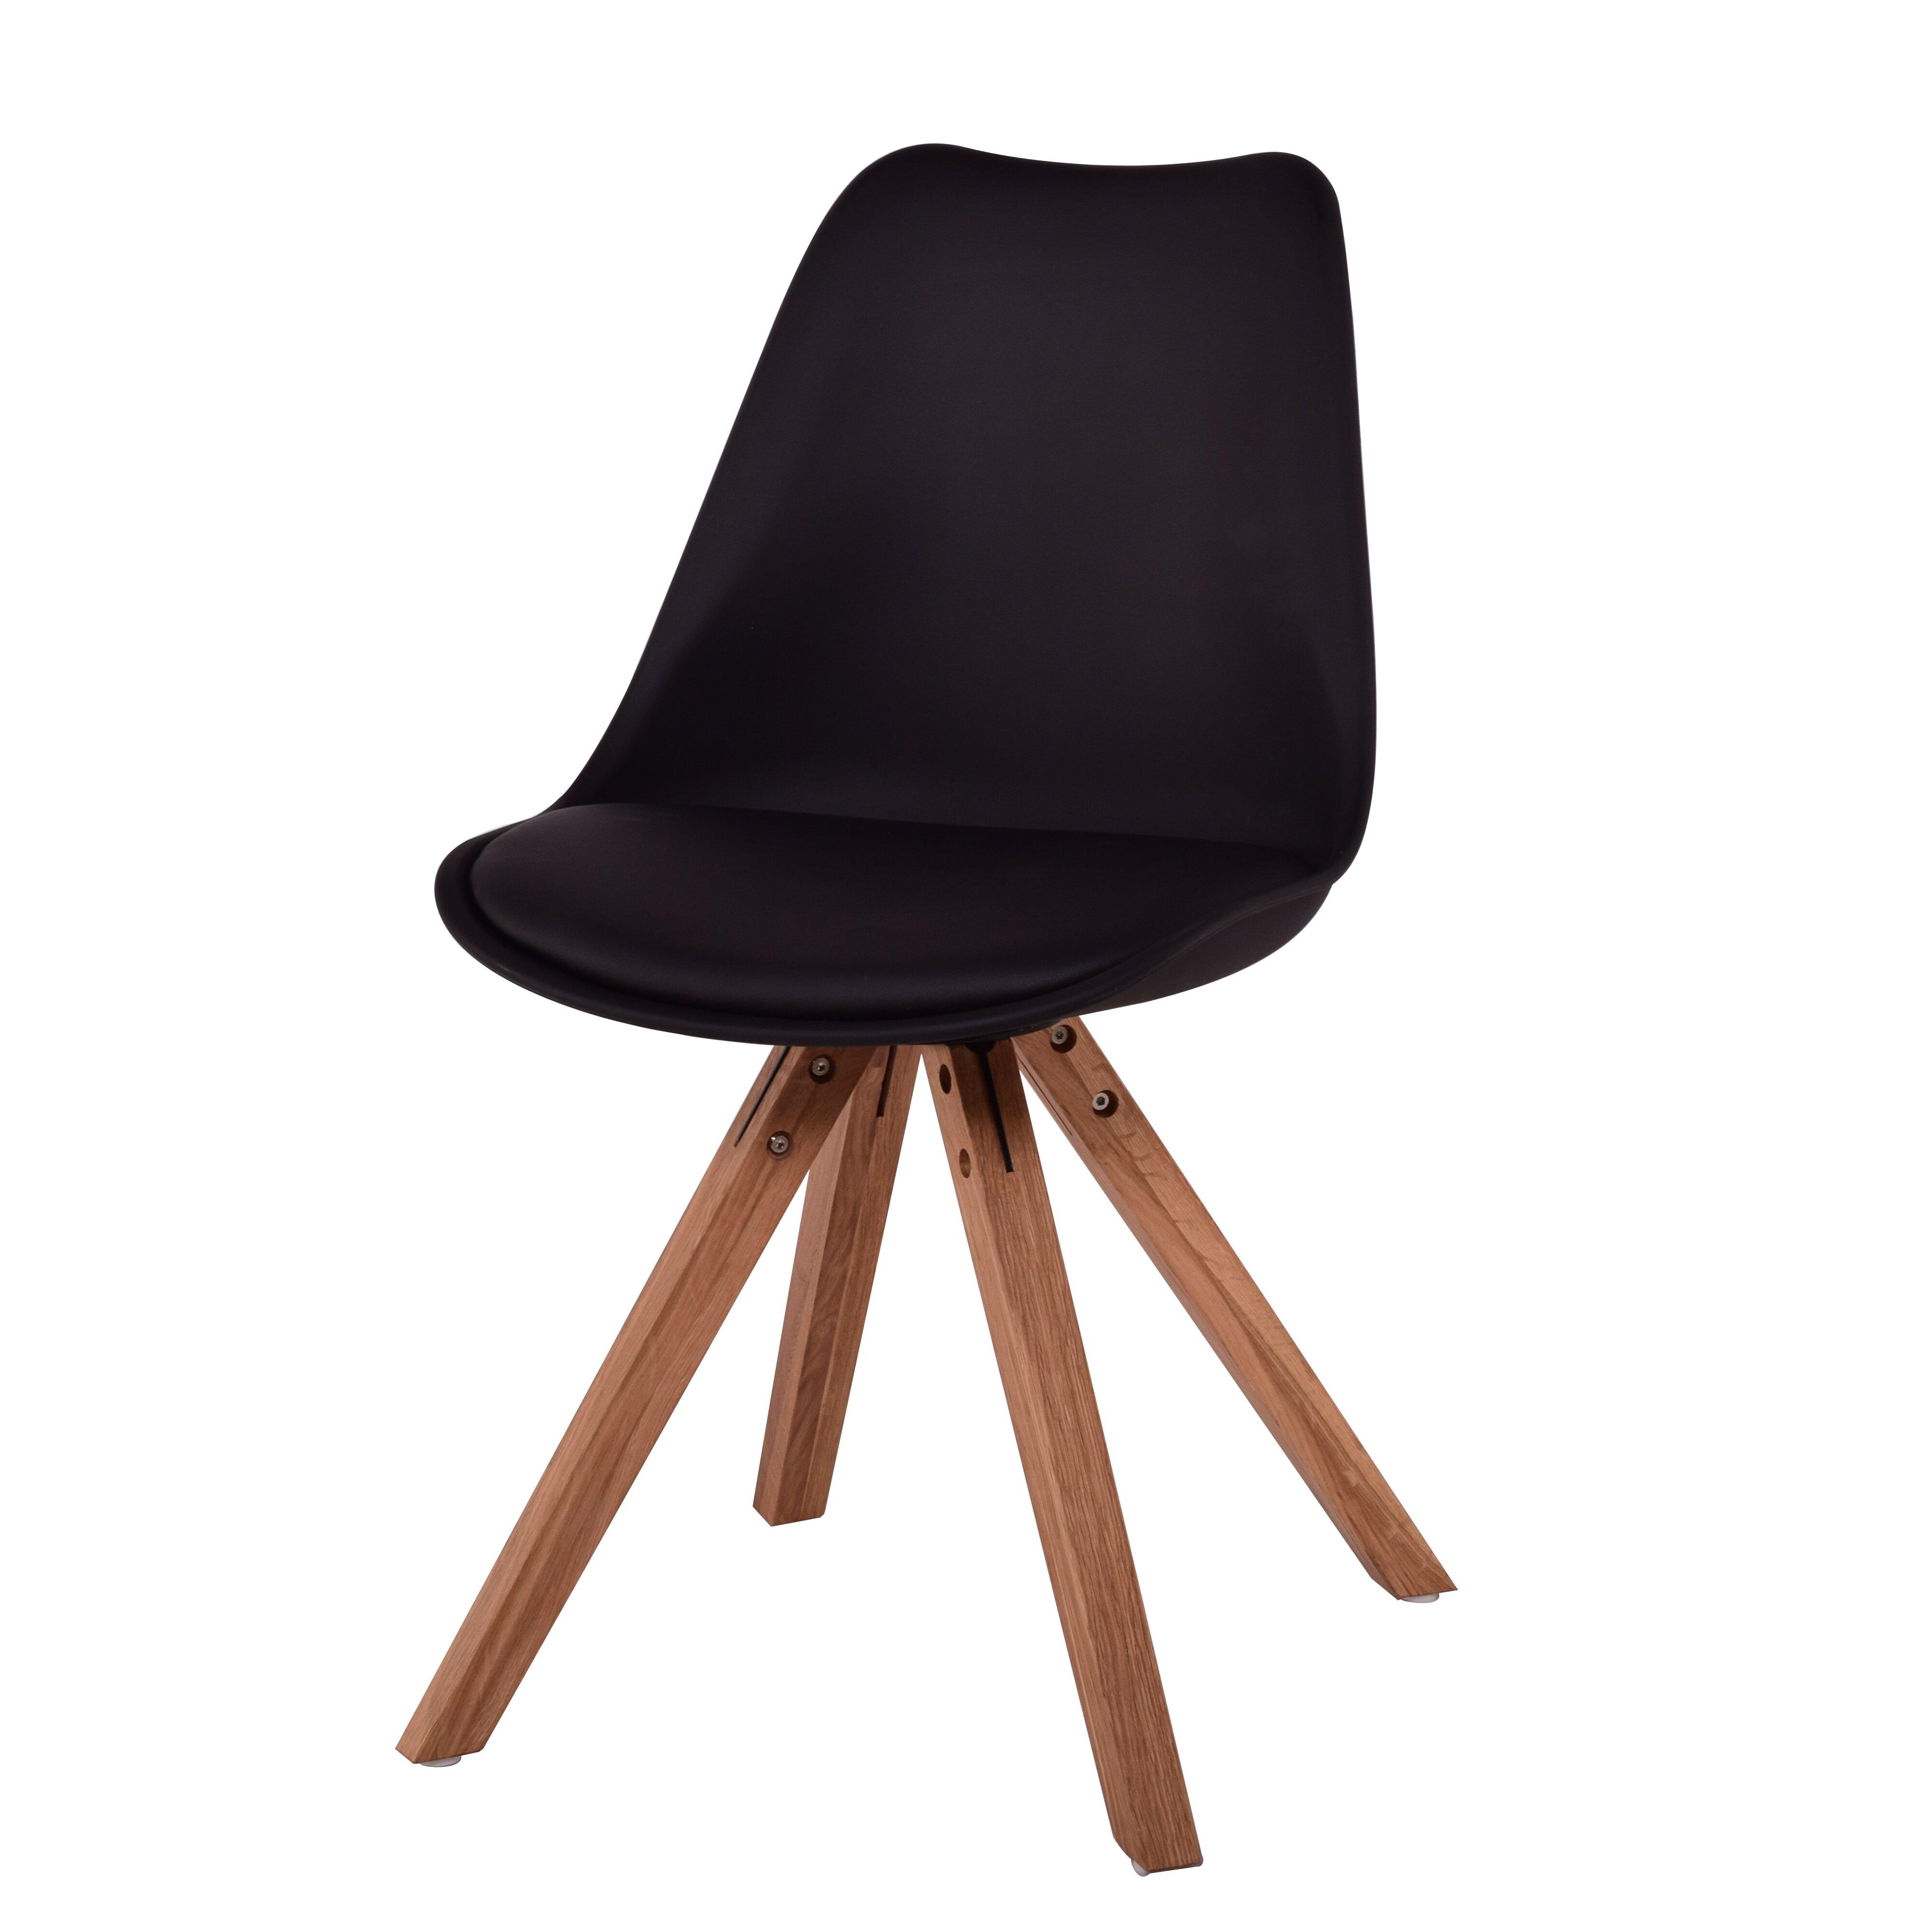 Modern chairs usa lugano side chair wayfair for Side chairs